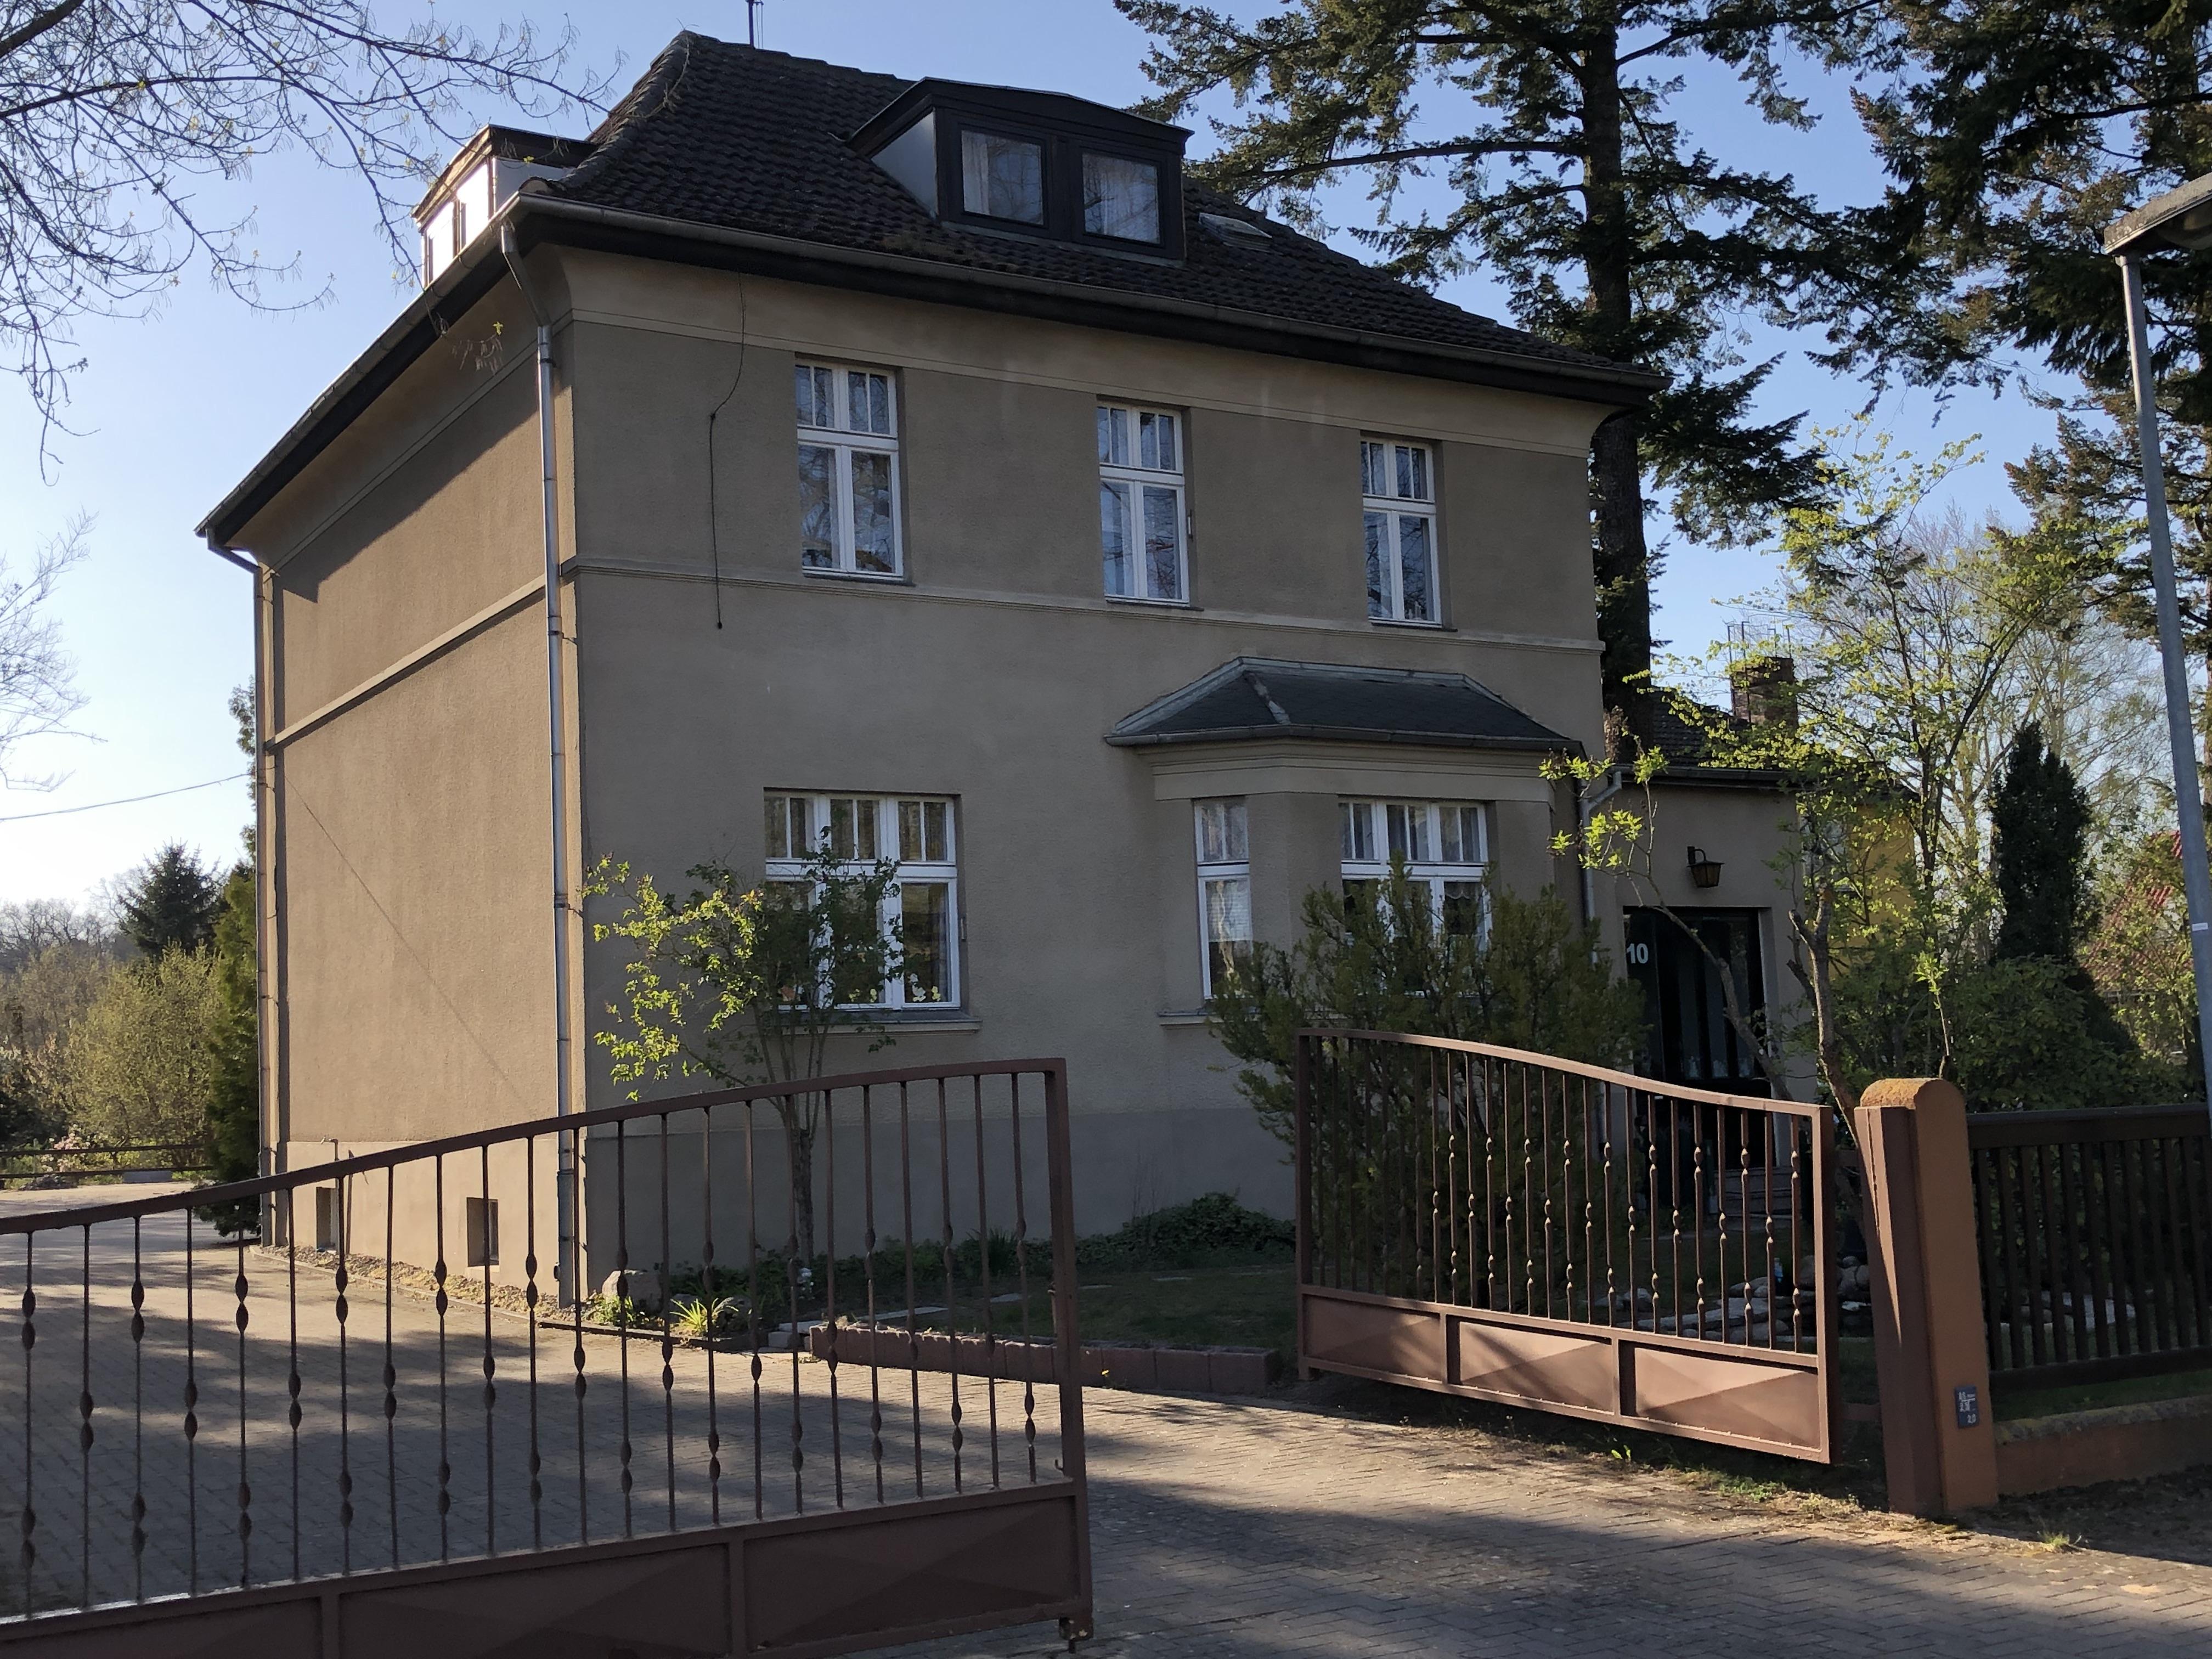 Buergerhorststraße 10